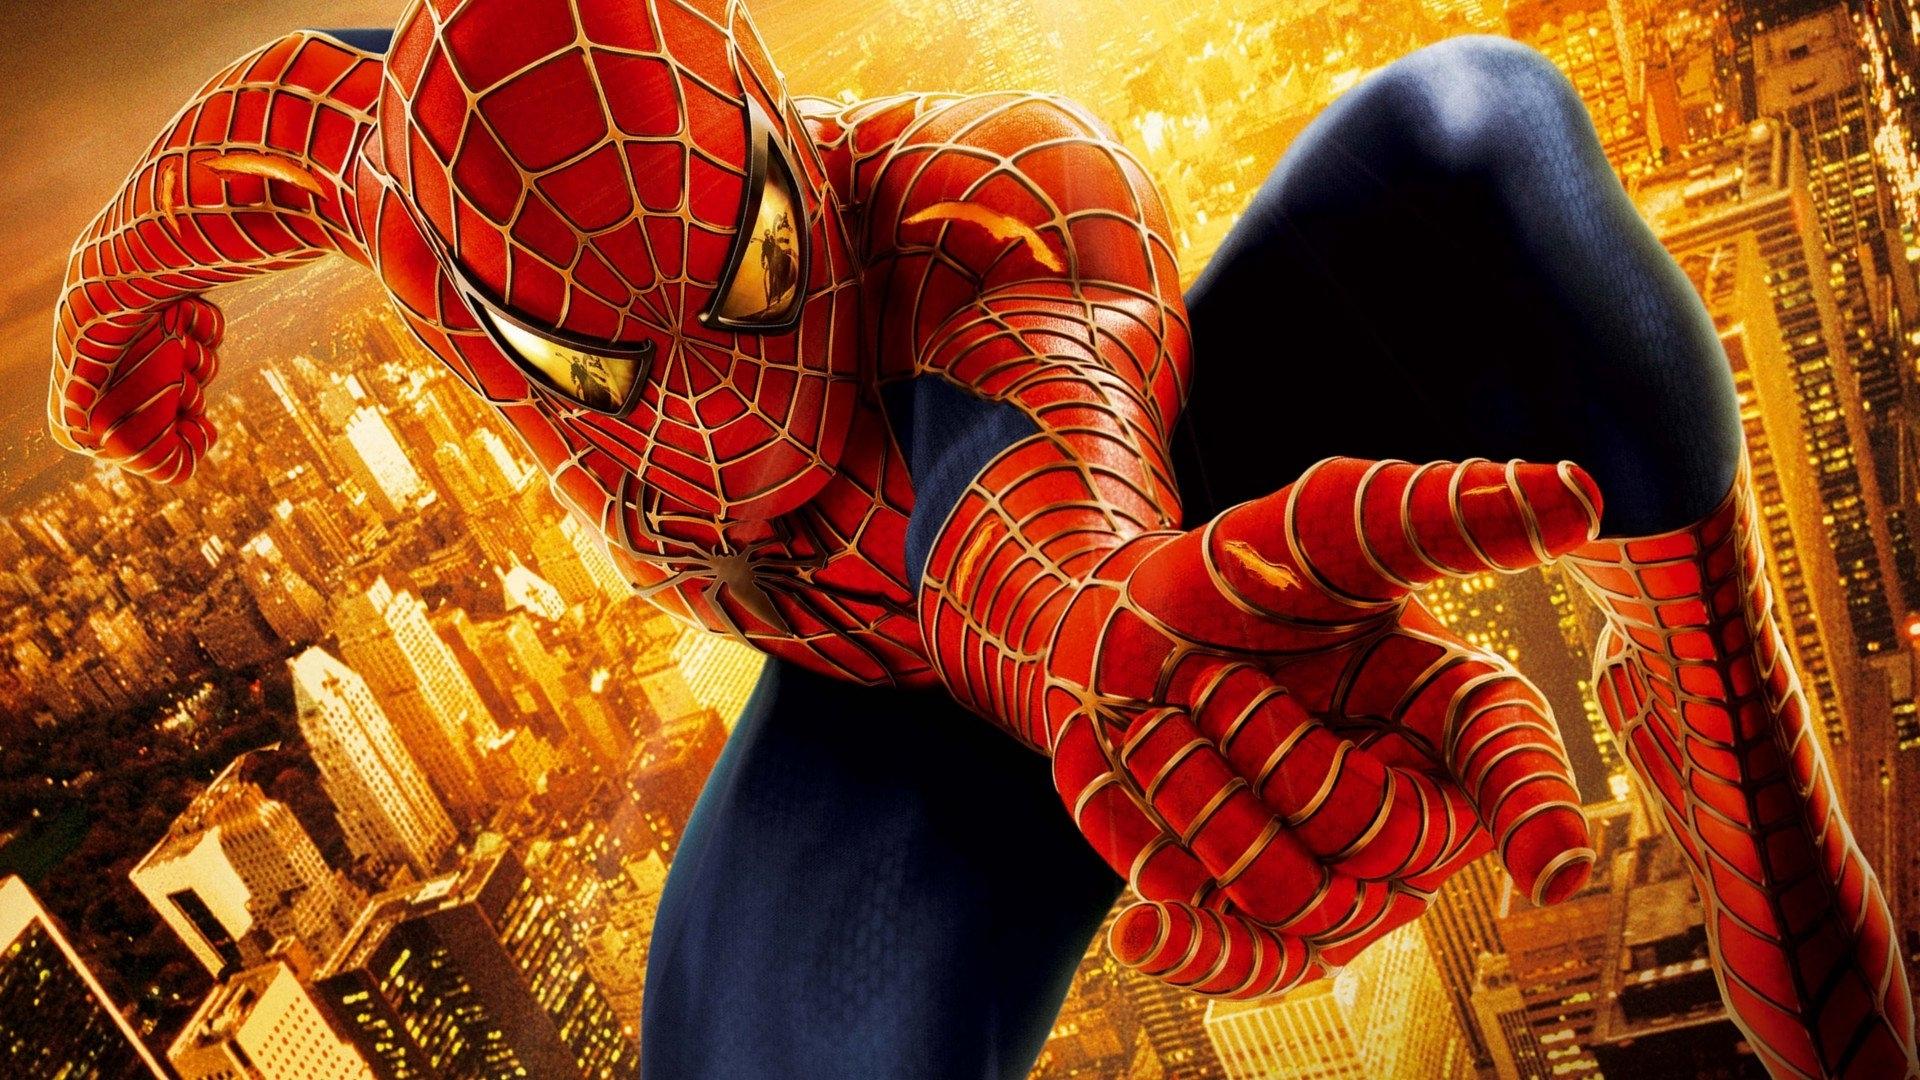 spider-man 2 full hd fond d'écran and arrière-plan | 1920x1080 | id